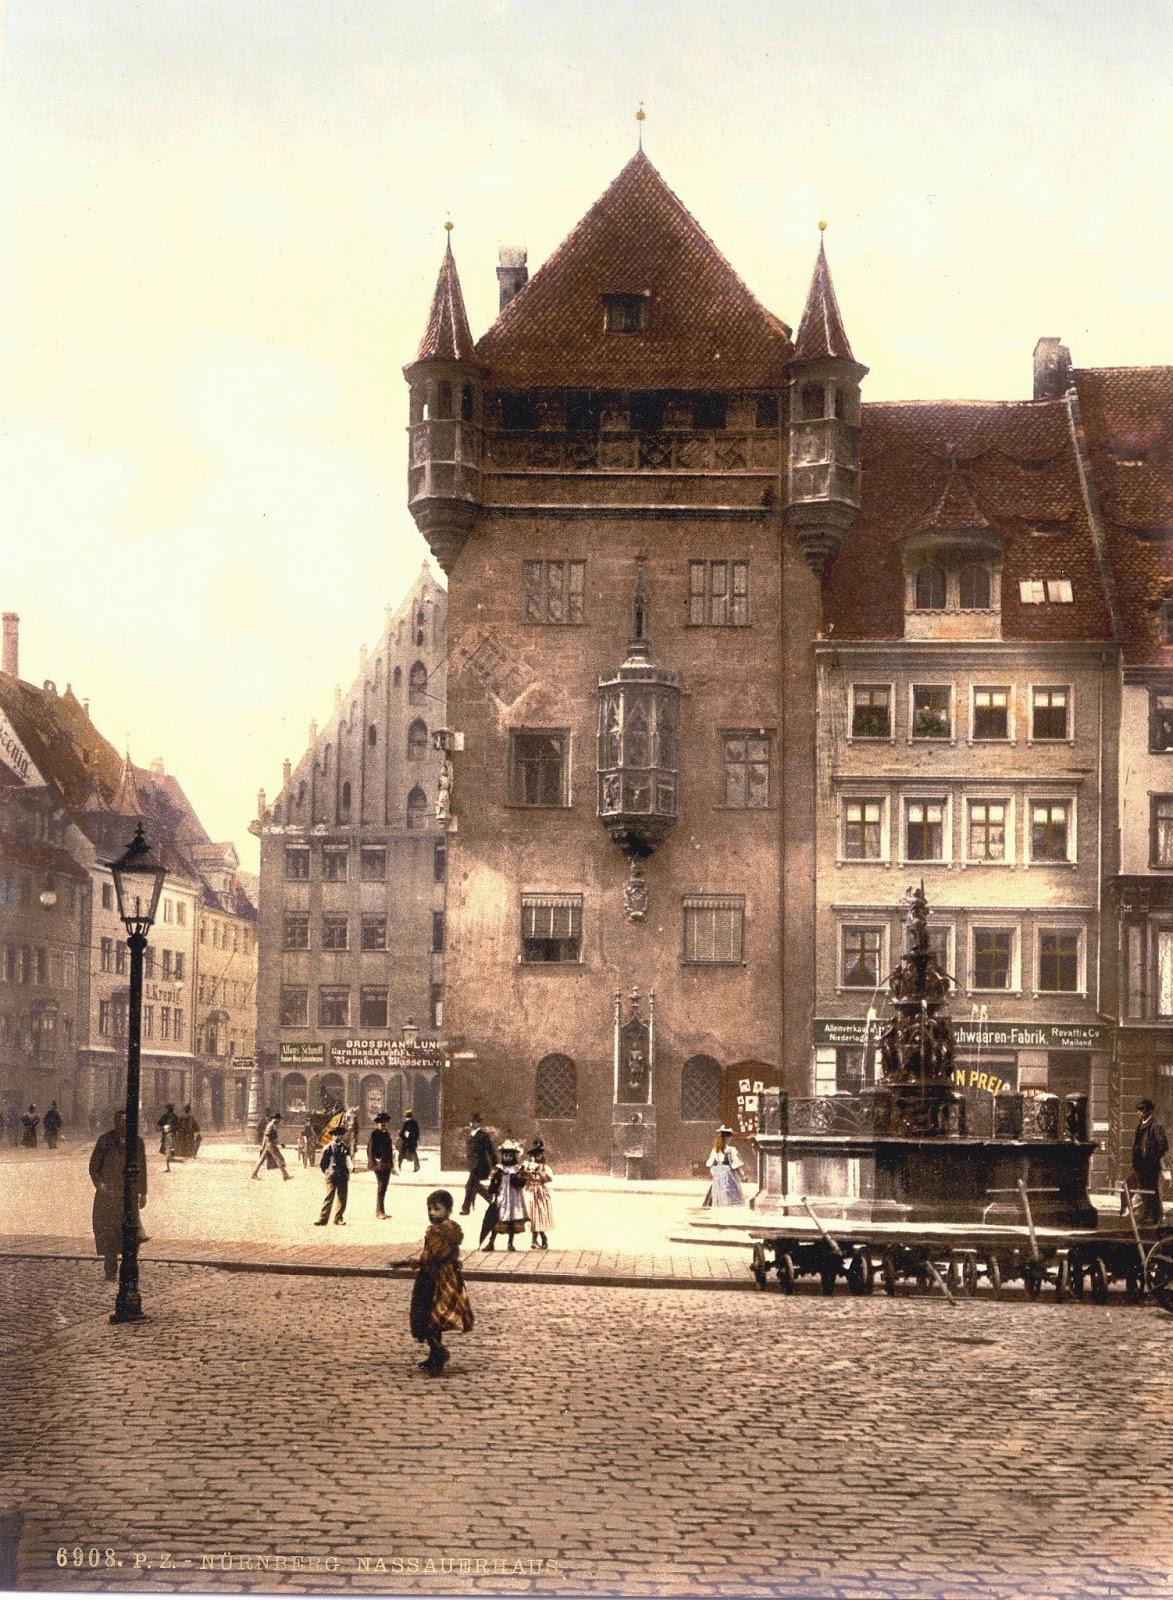 Nassauer_Haus_1900